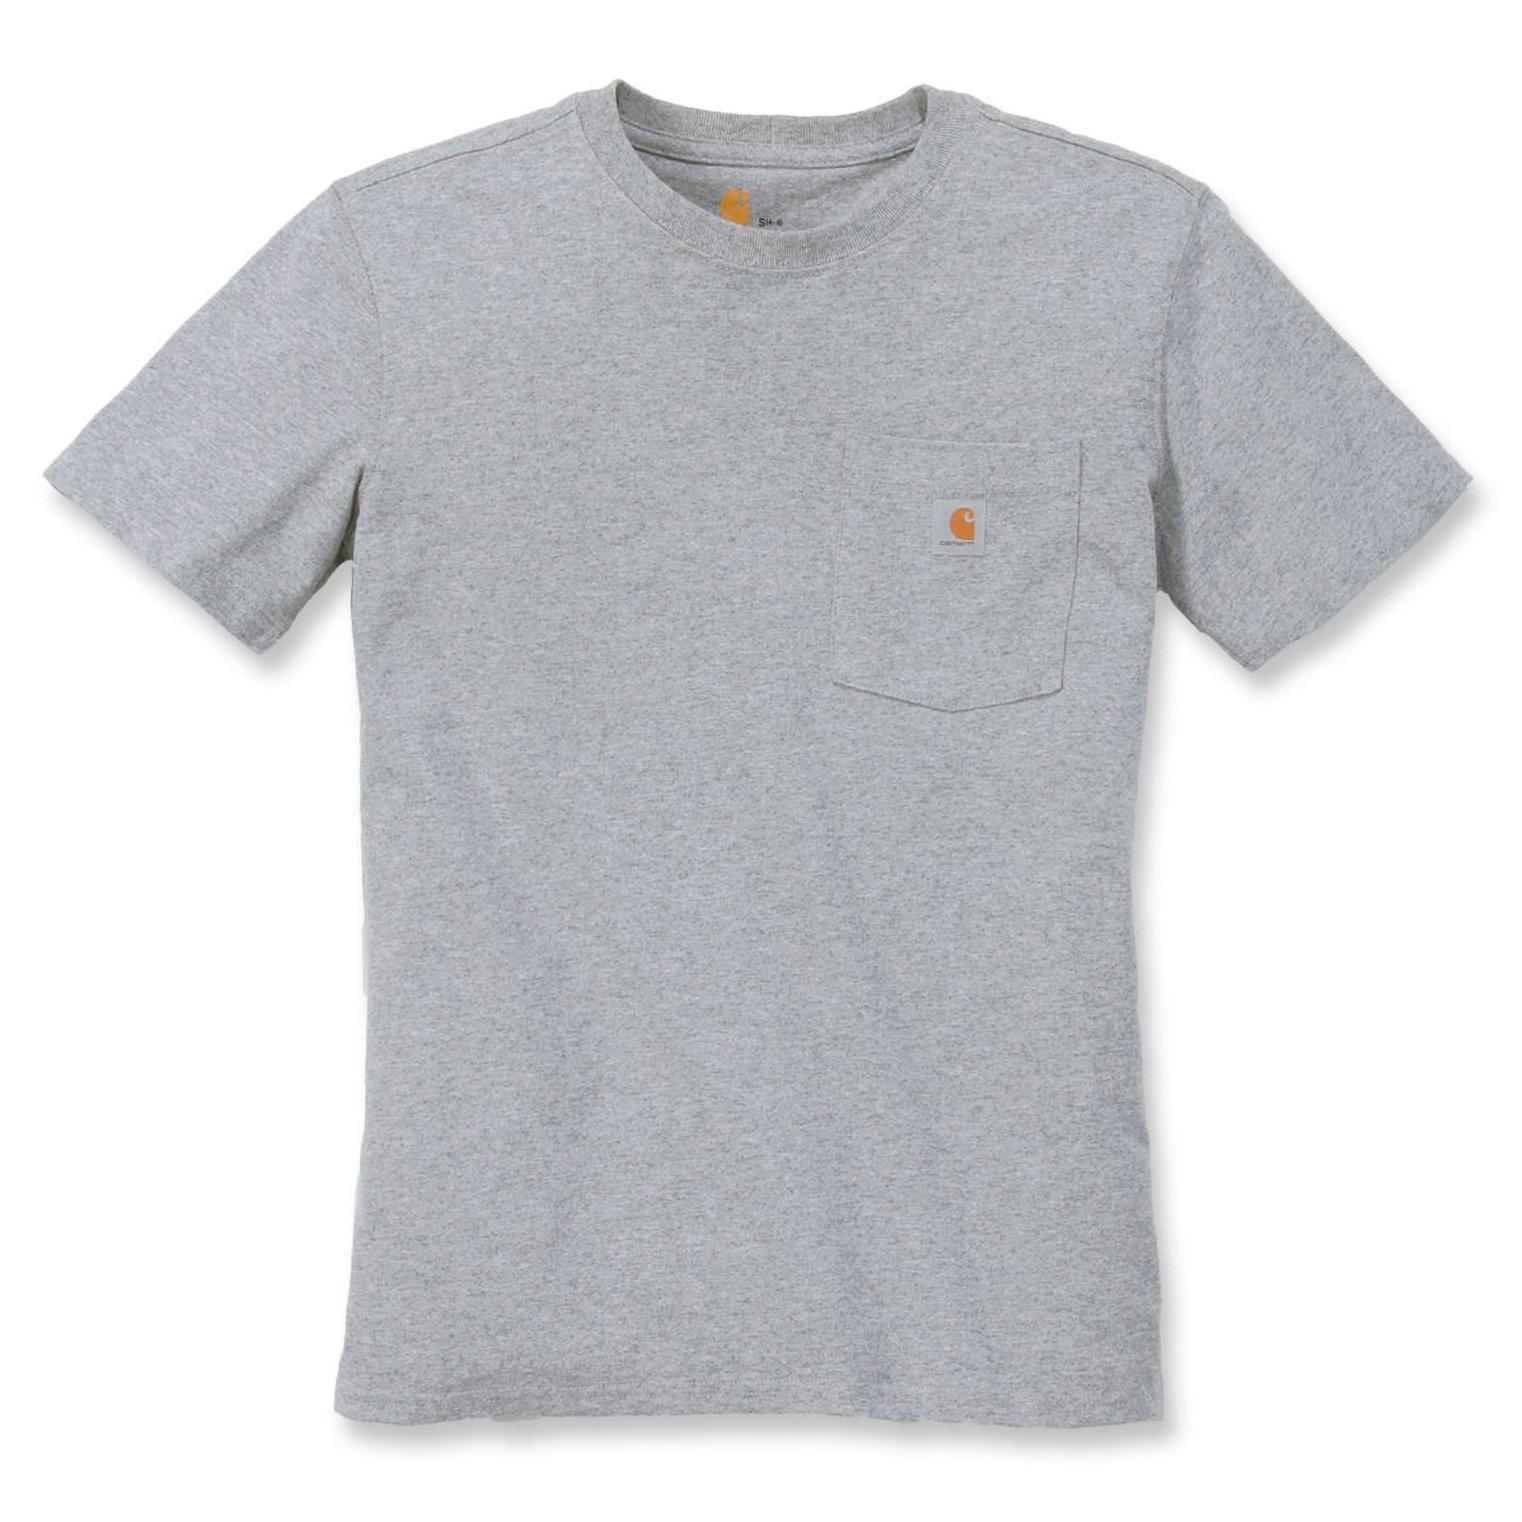 Футболка женская Carhartt WK87 Workwear Pocket T-Shirt - 103067 (Heather Grey, XS)